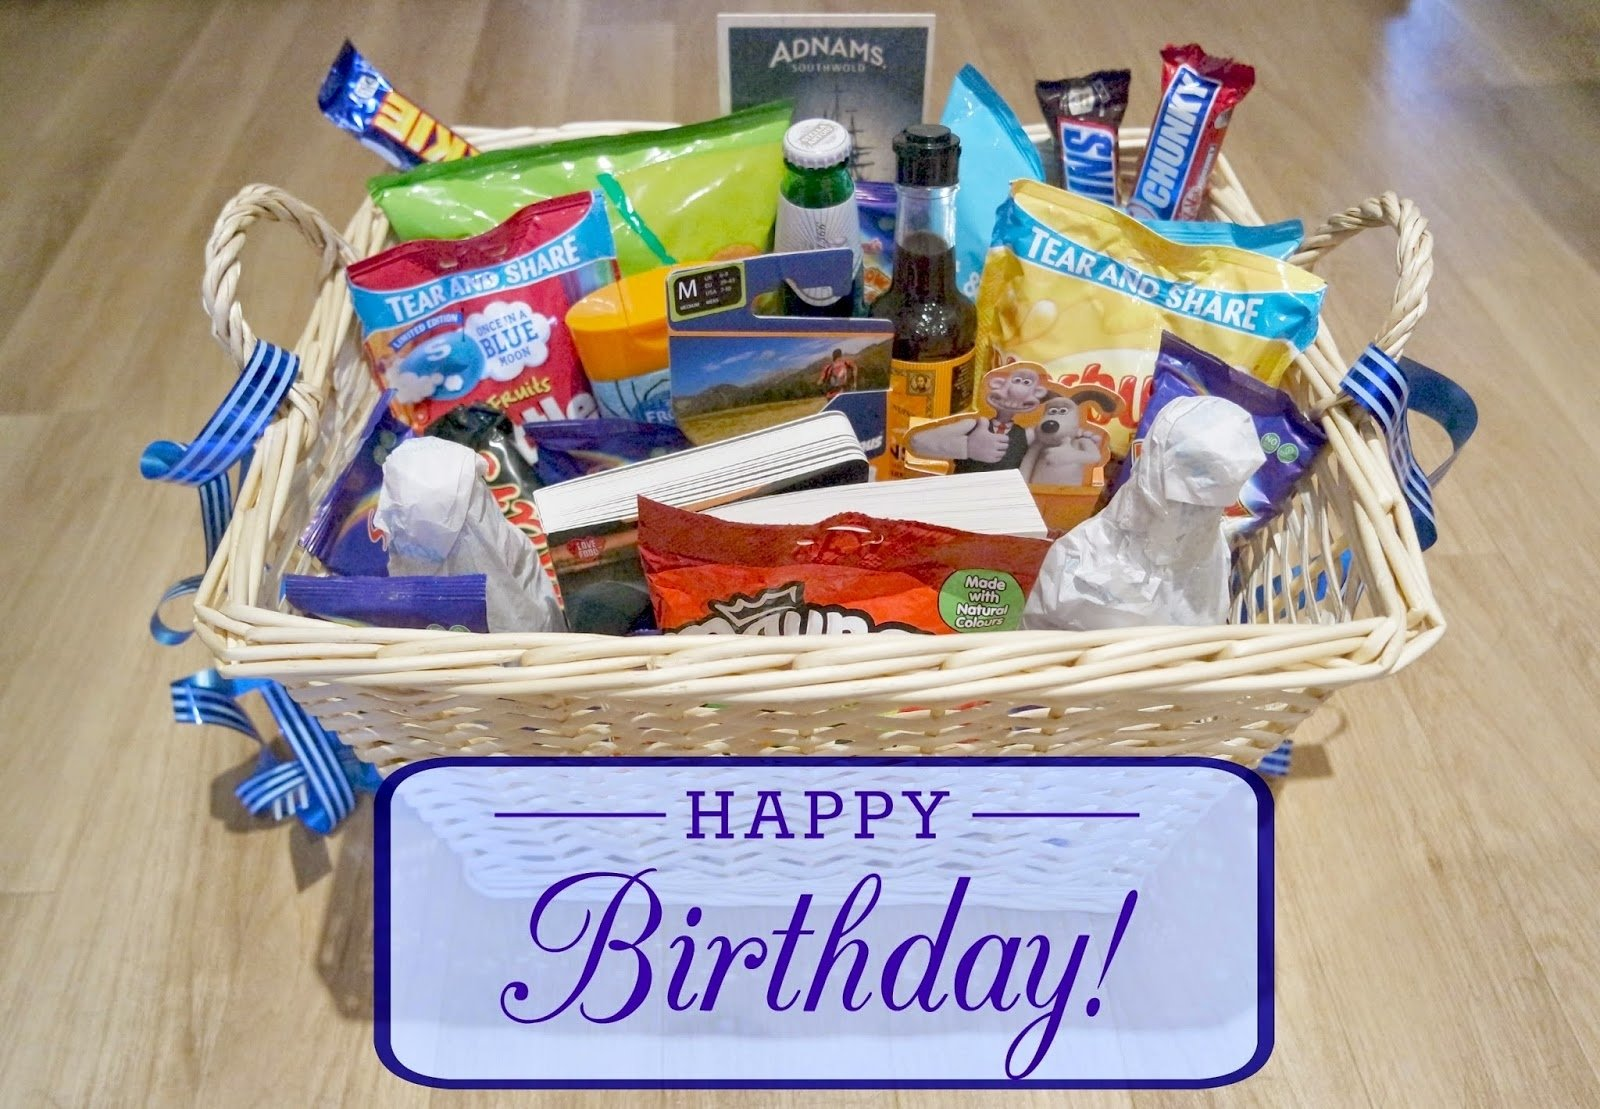 10 Trendy Ideas For 50Th Birthday Gift uptown peach my dads 50th birthday hamper mens gift ideas 8 2020